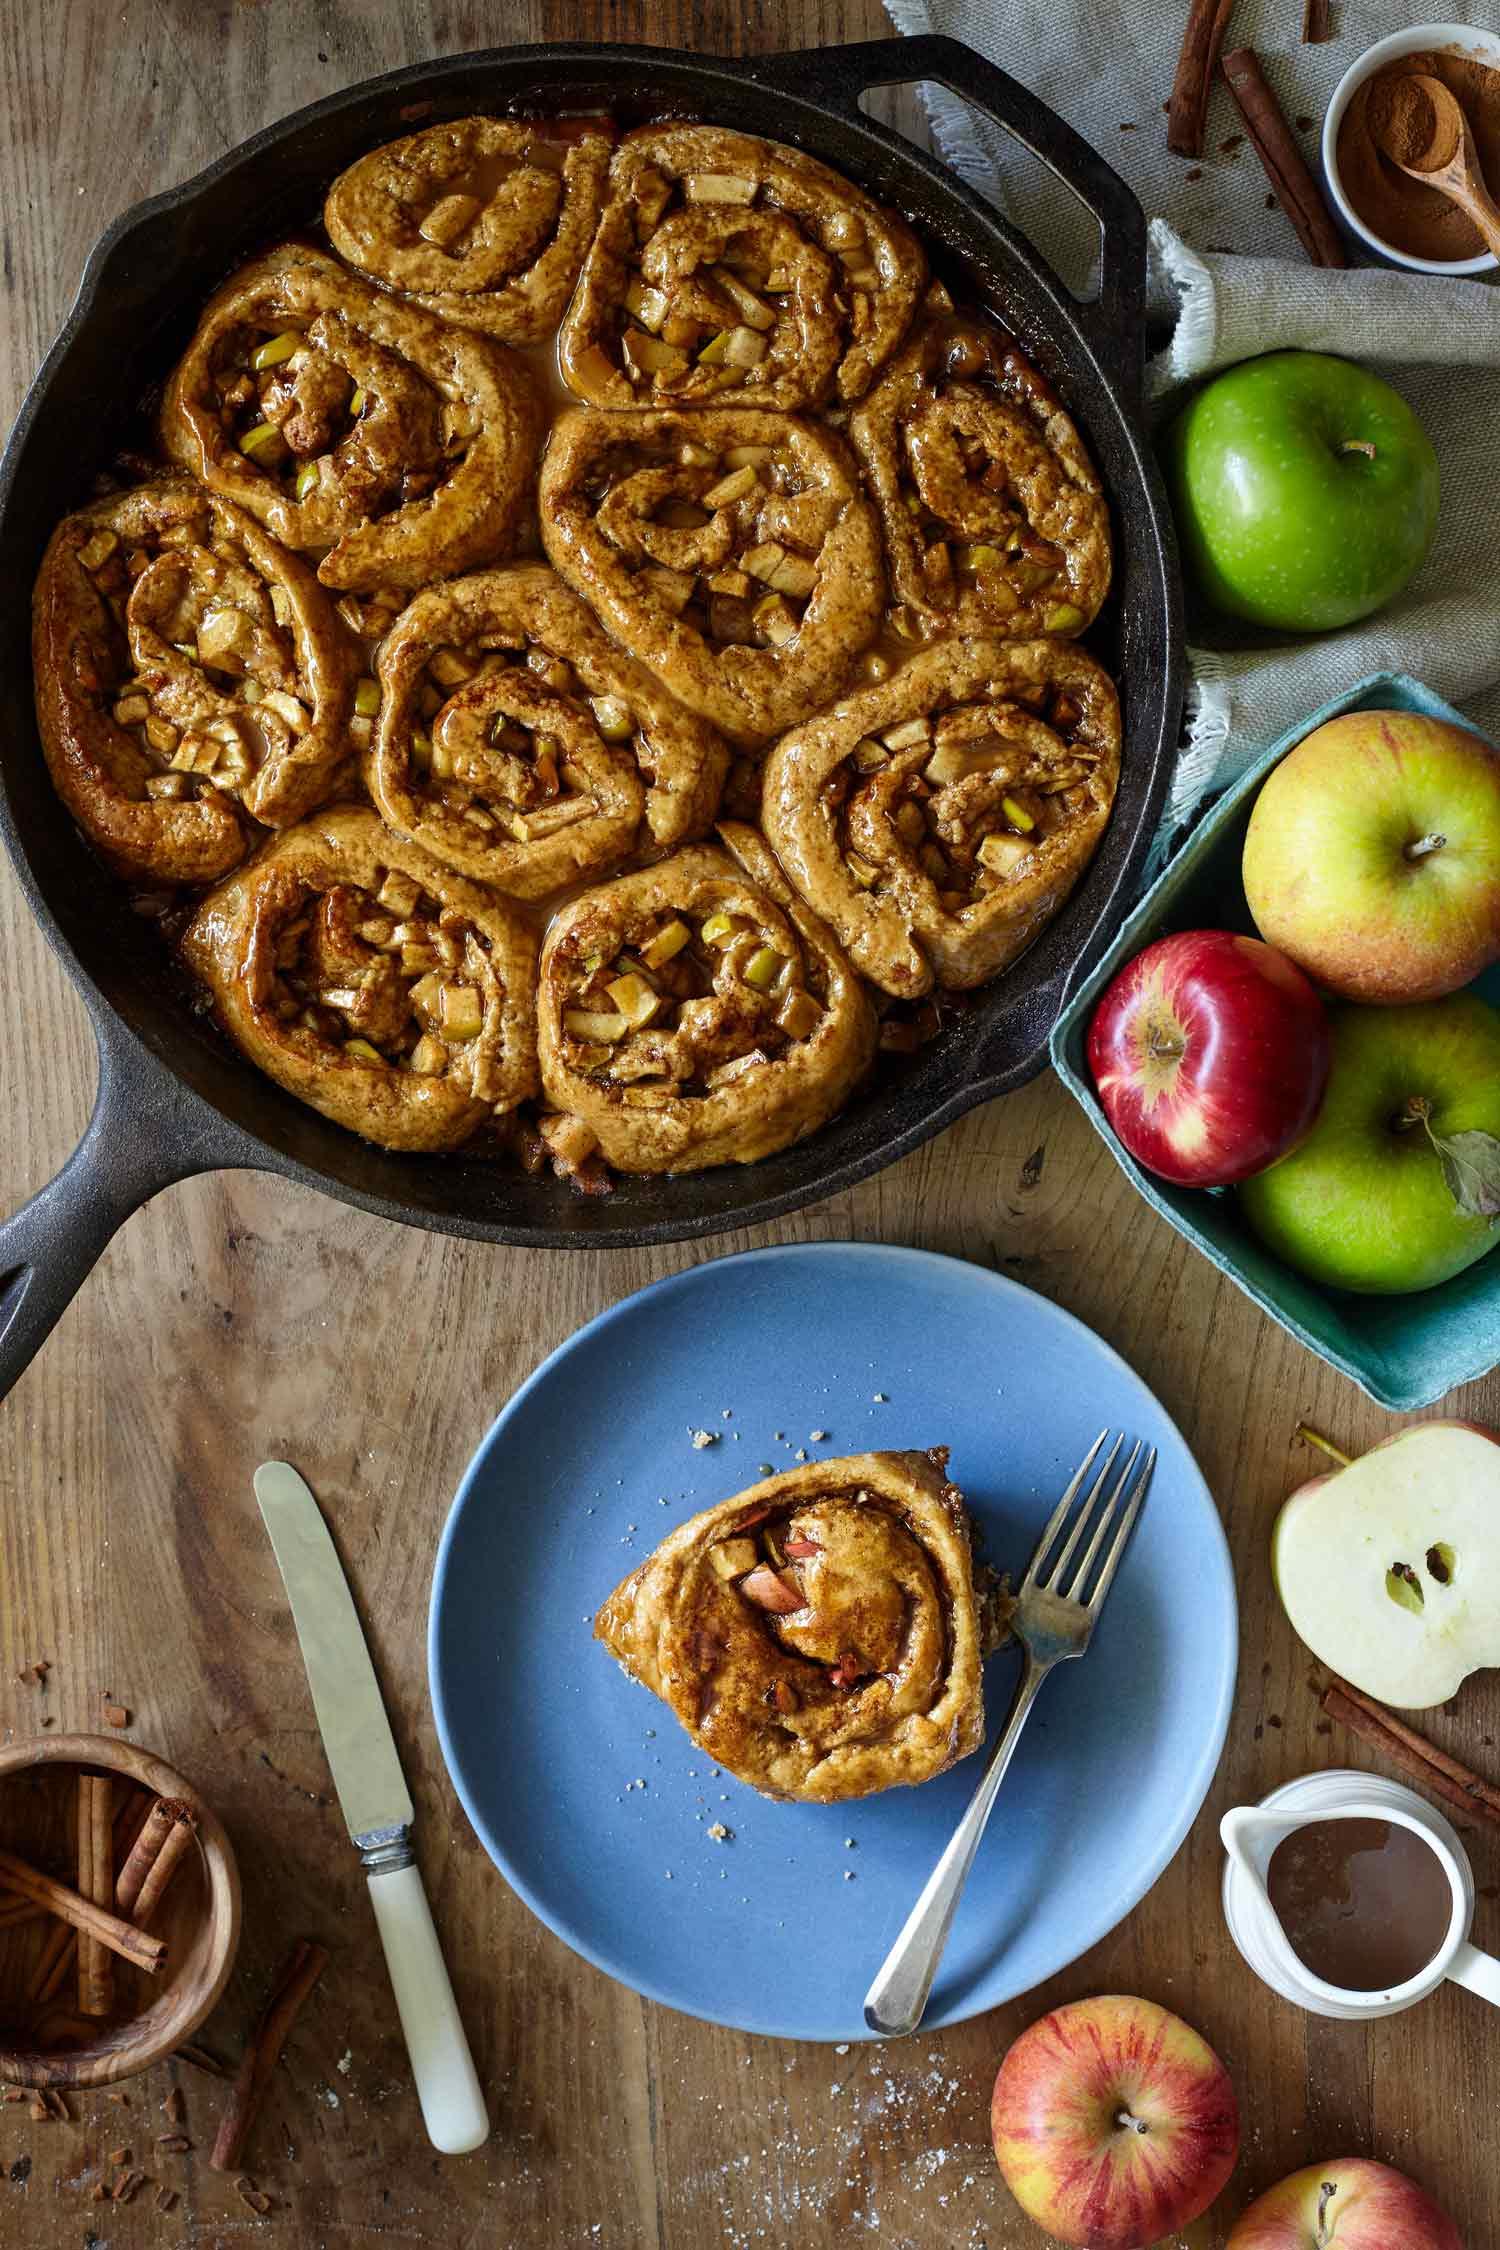 Caramel-Apple-Sticky-Cinnamon-Buns-Evergreen-Kitchen-1.jpg